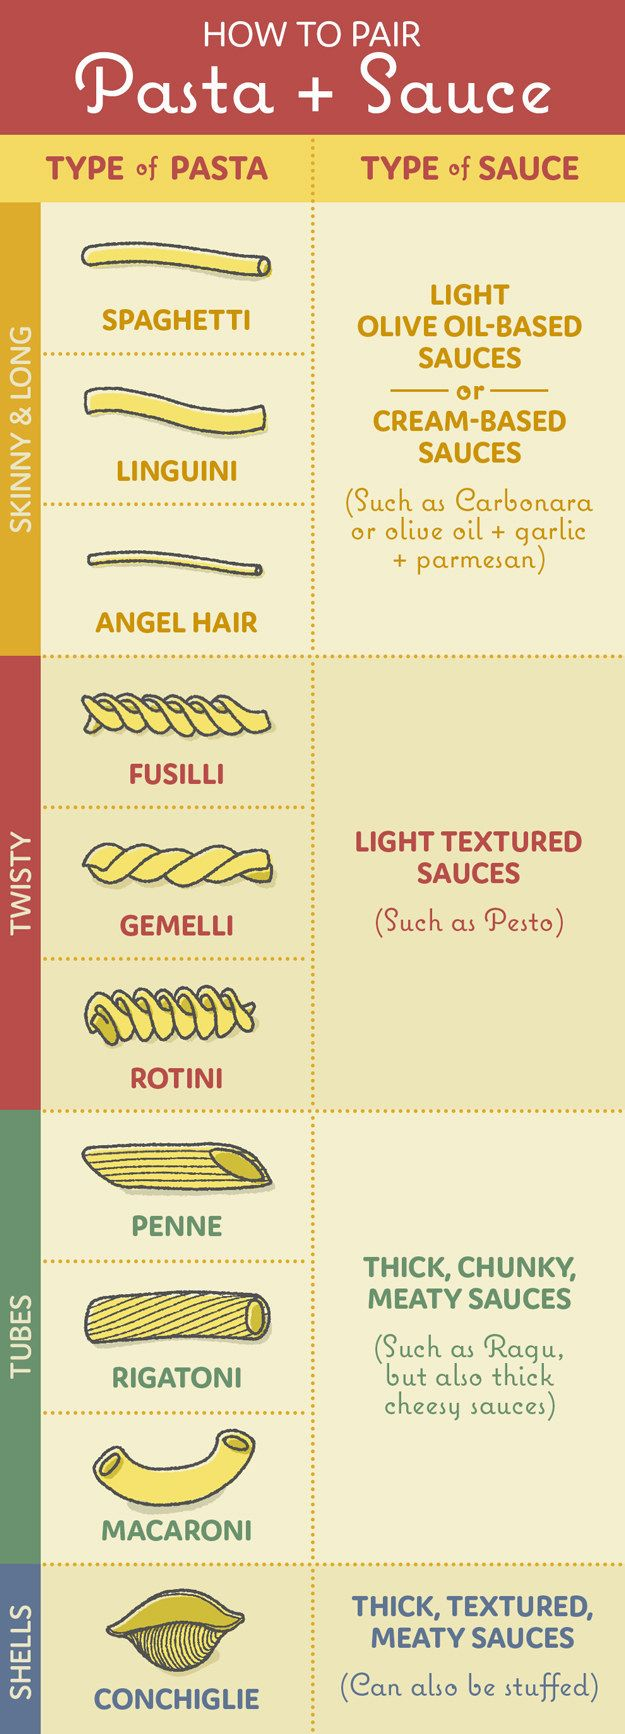 How to Pair Pasta + Sauce